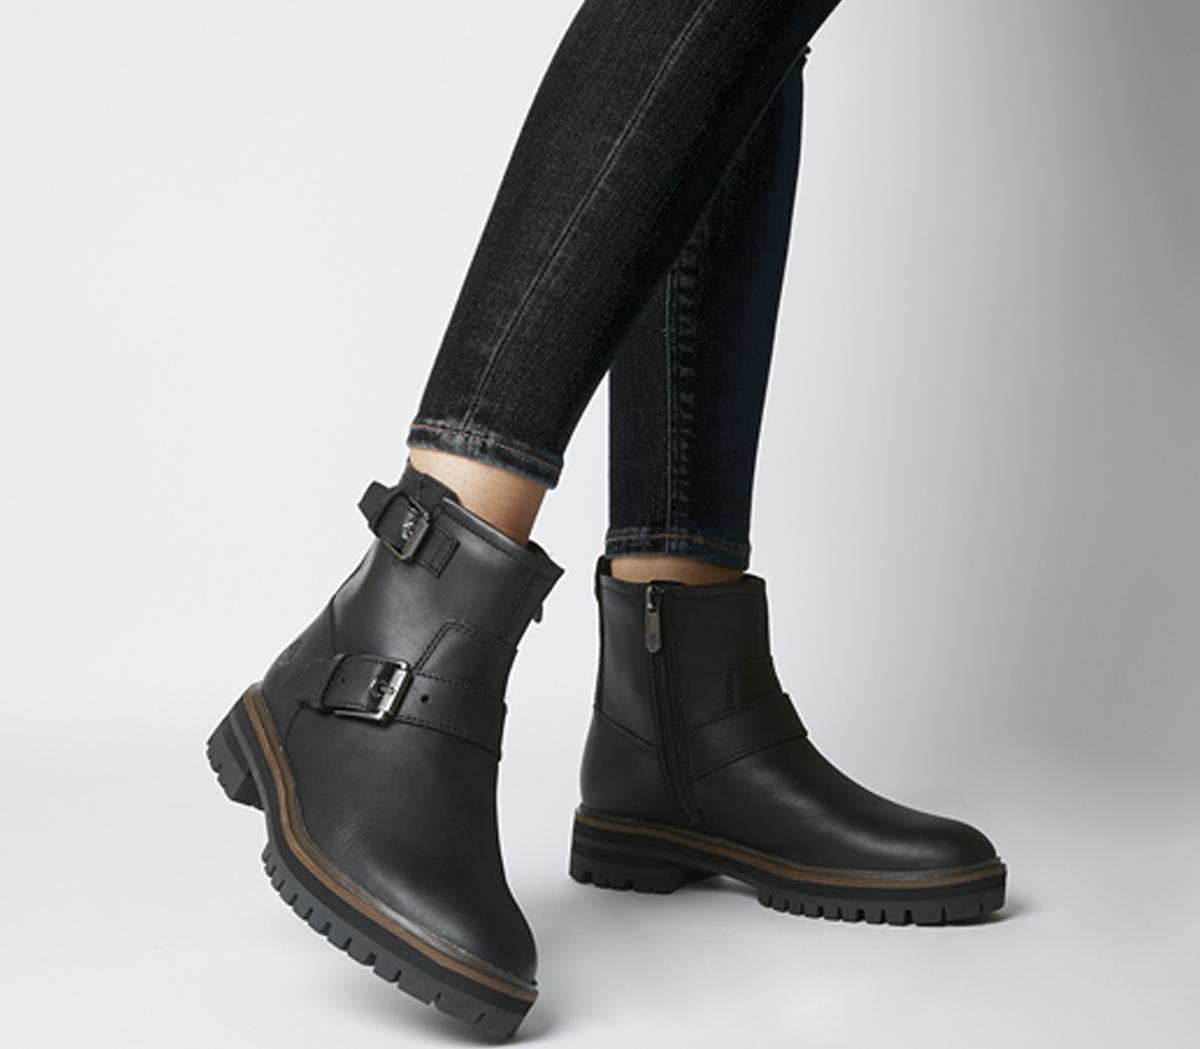 London Square Biker Boots